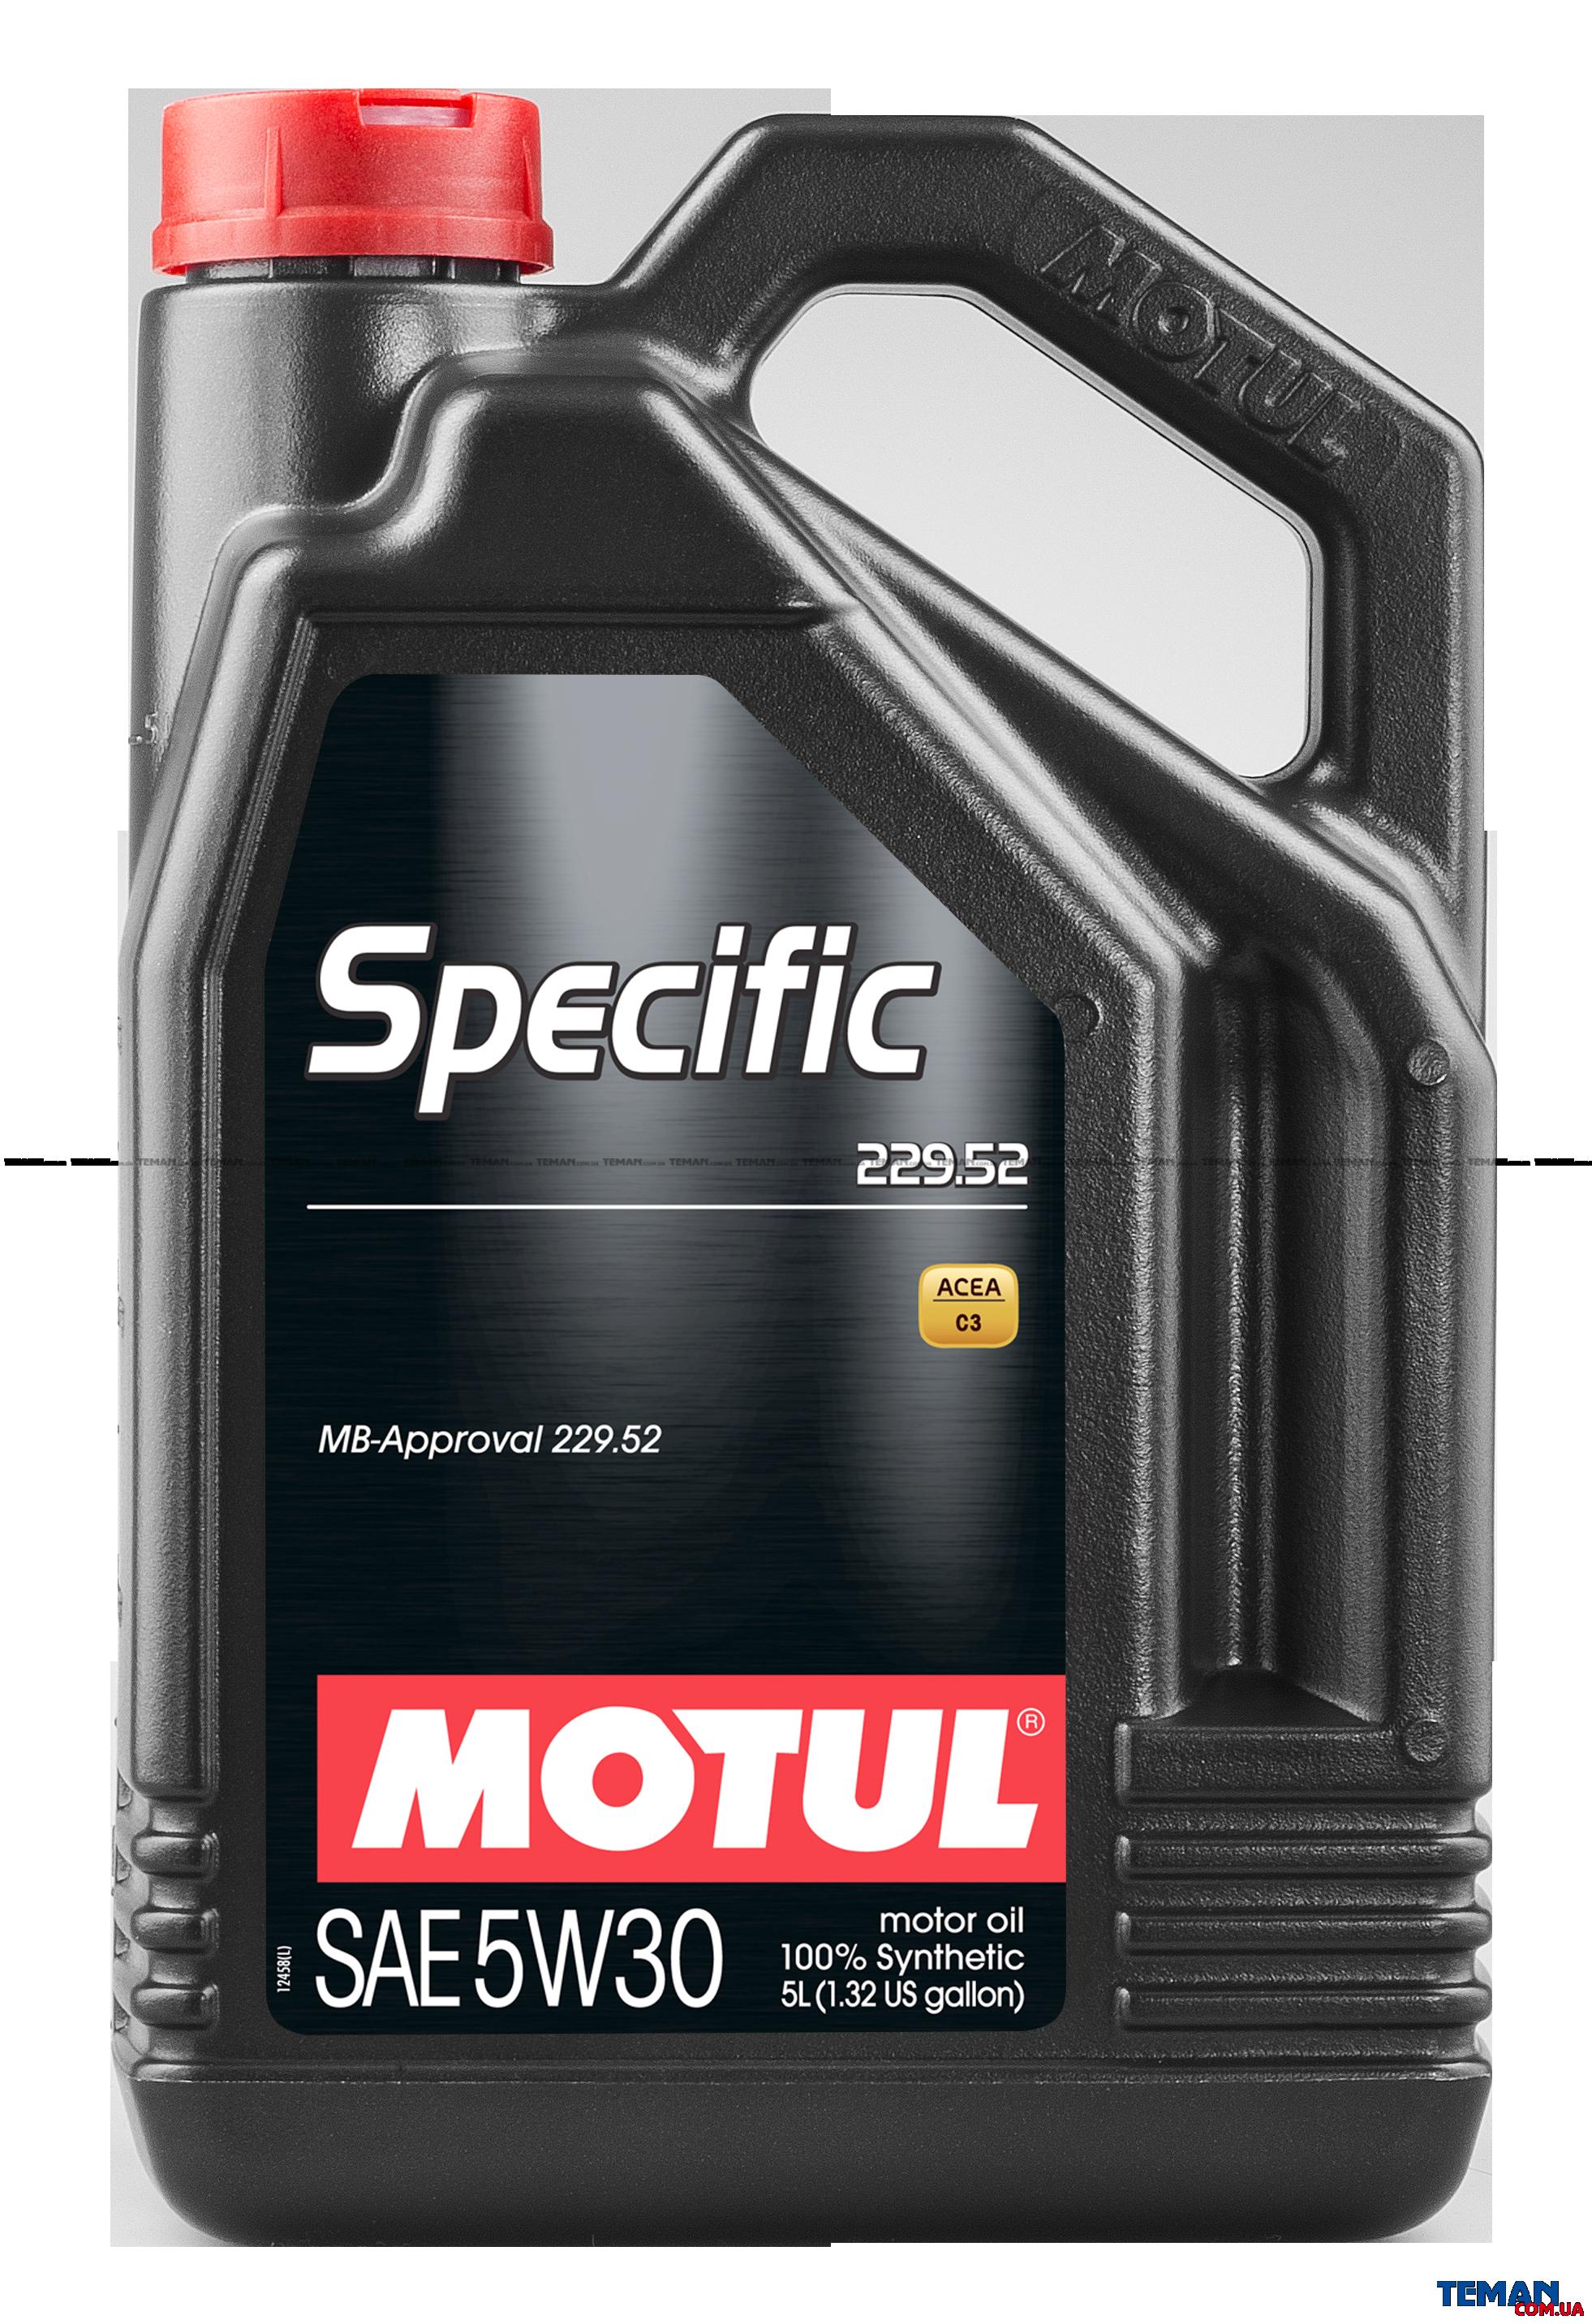 Синтетическое моторное масло SPECIFIC 229.52 5W-30, 5 л